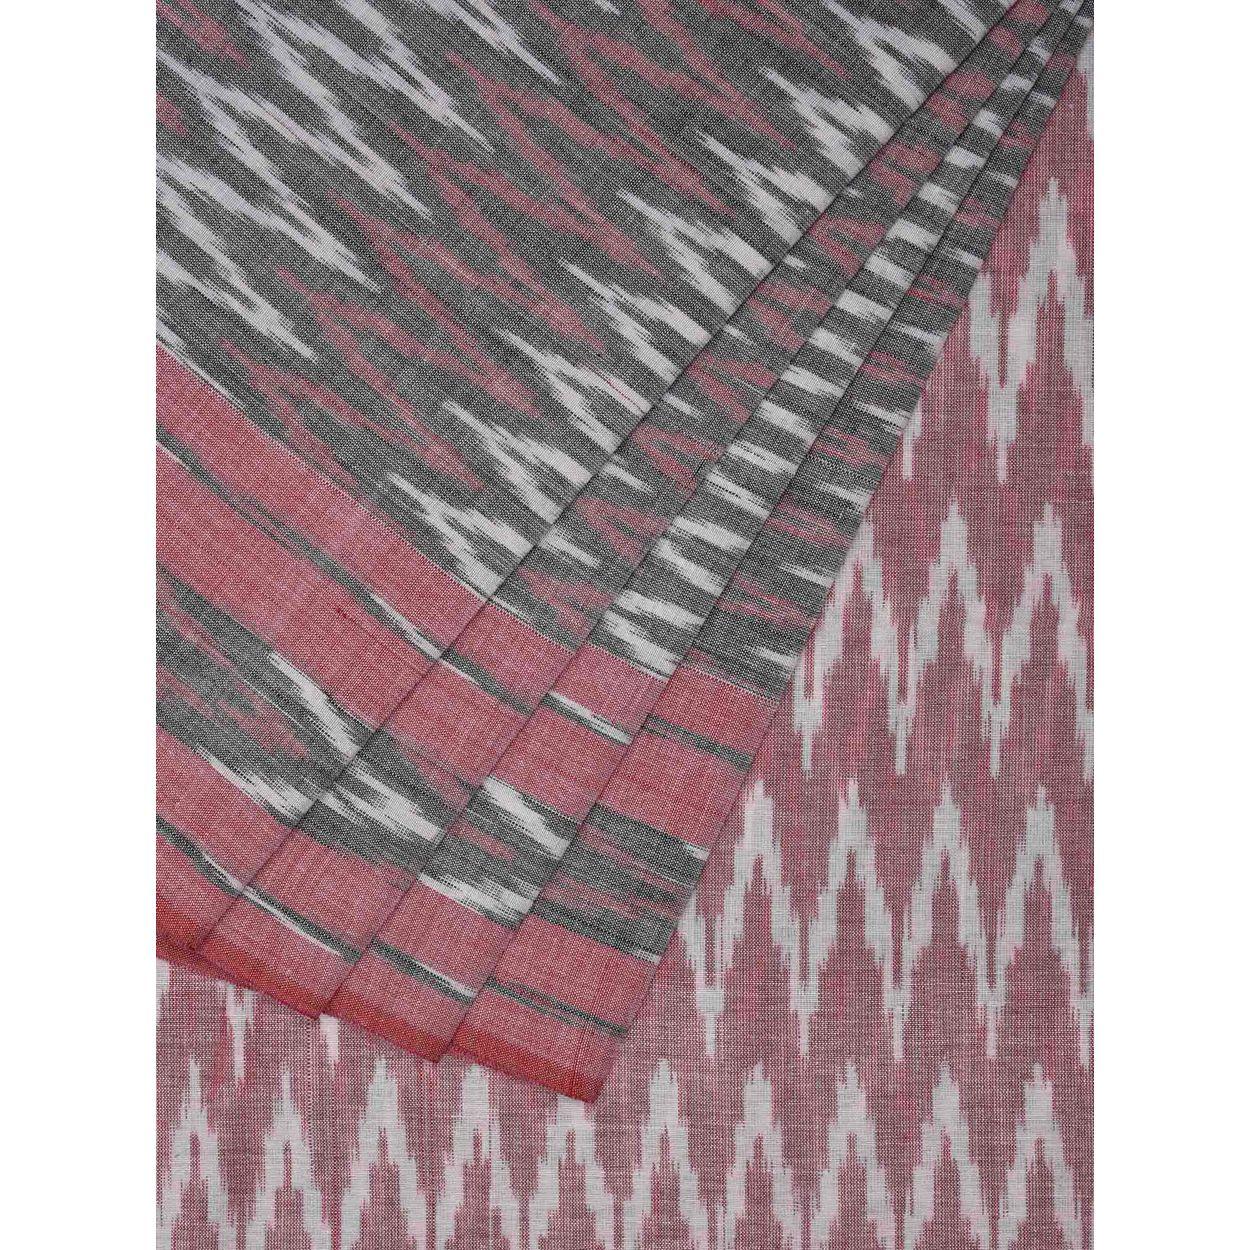 Baby Pink And Grey Color Sari Pochampally Ikat Cotton Handloom Blouse Zig Zag 1 2